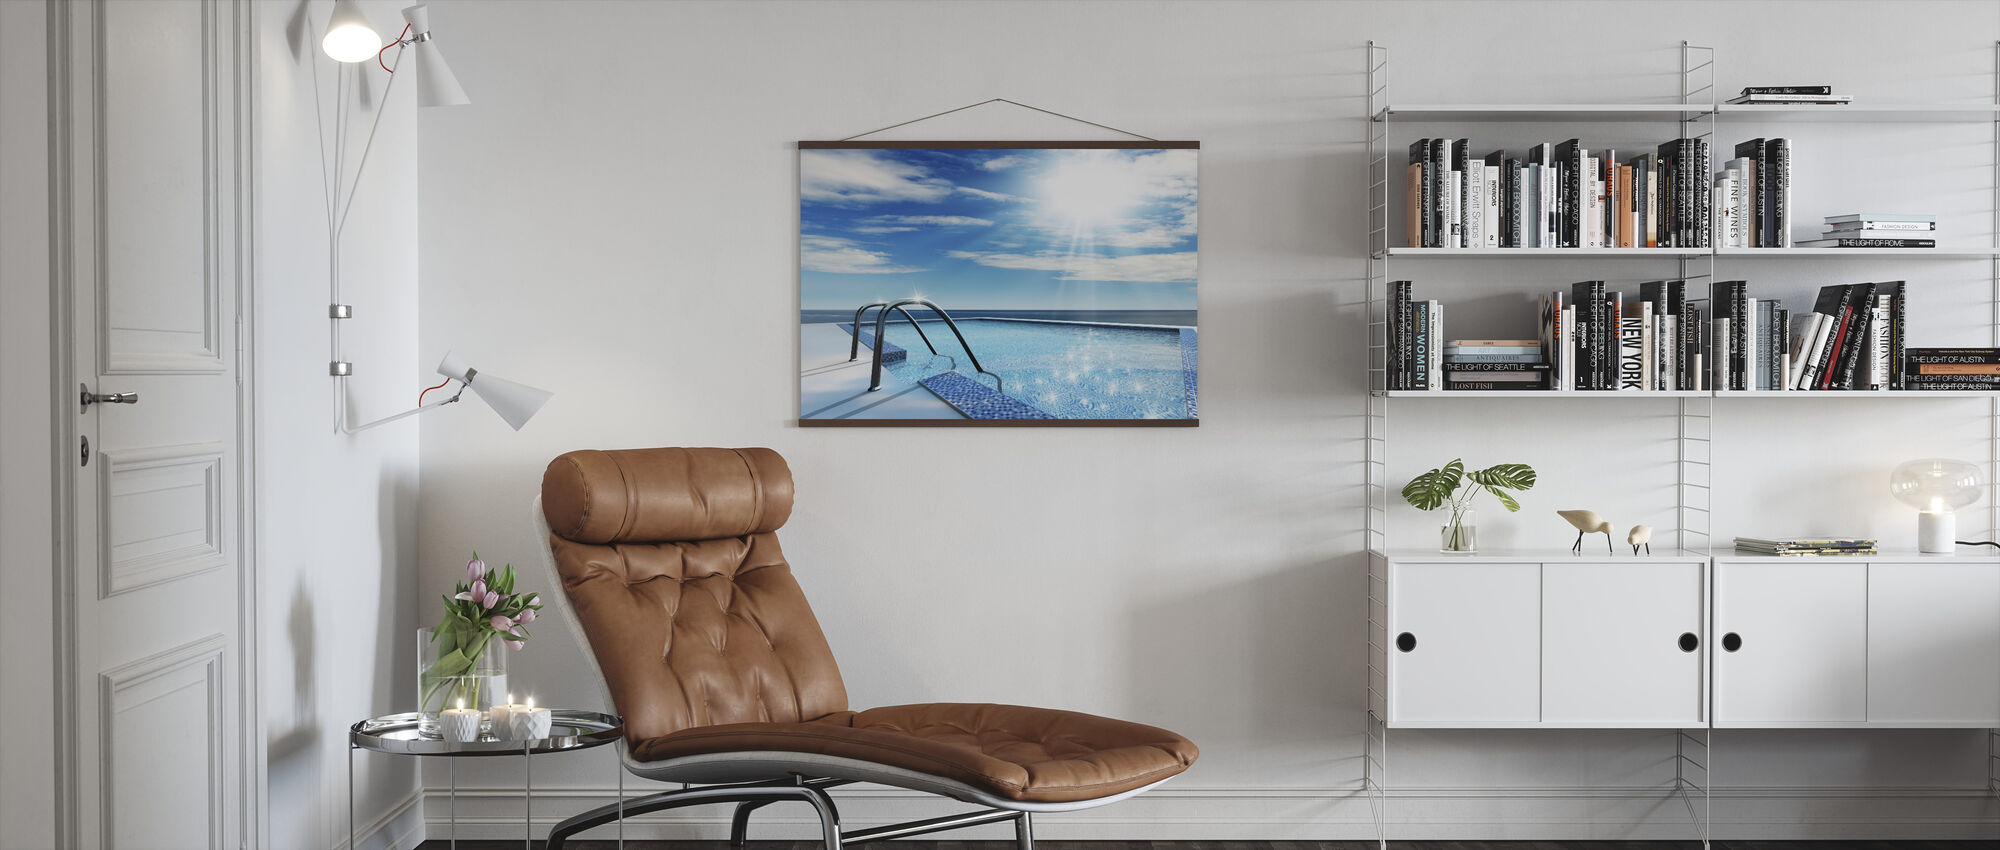 Swimming Pool - Poster - Living Room